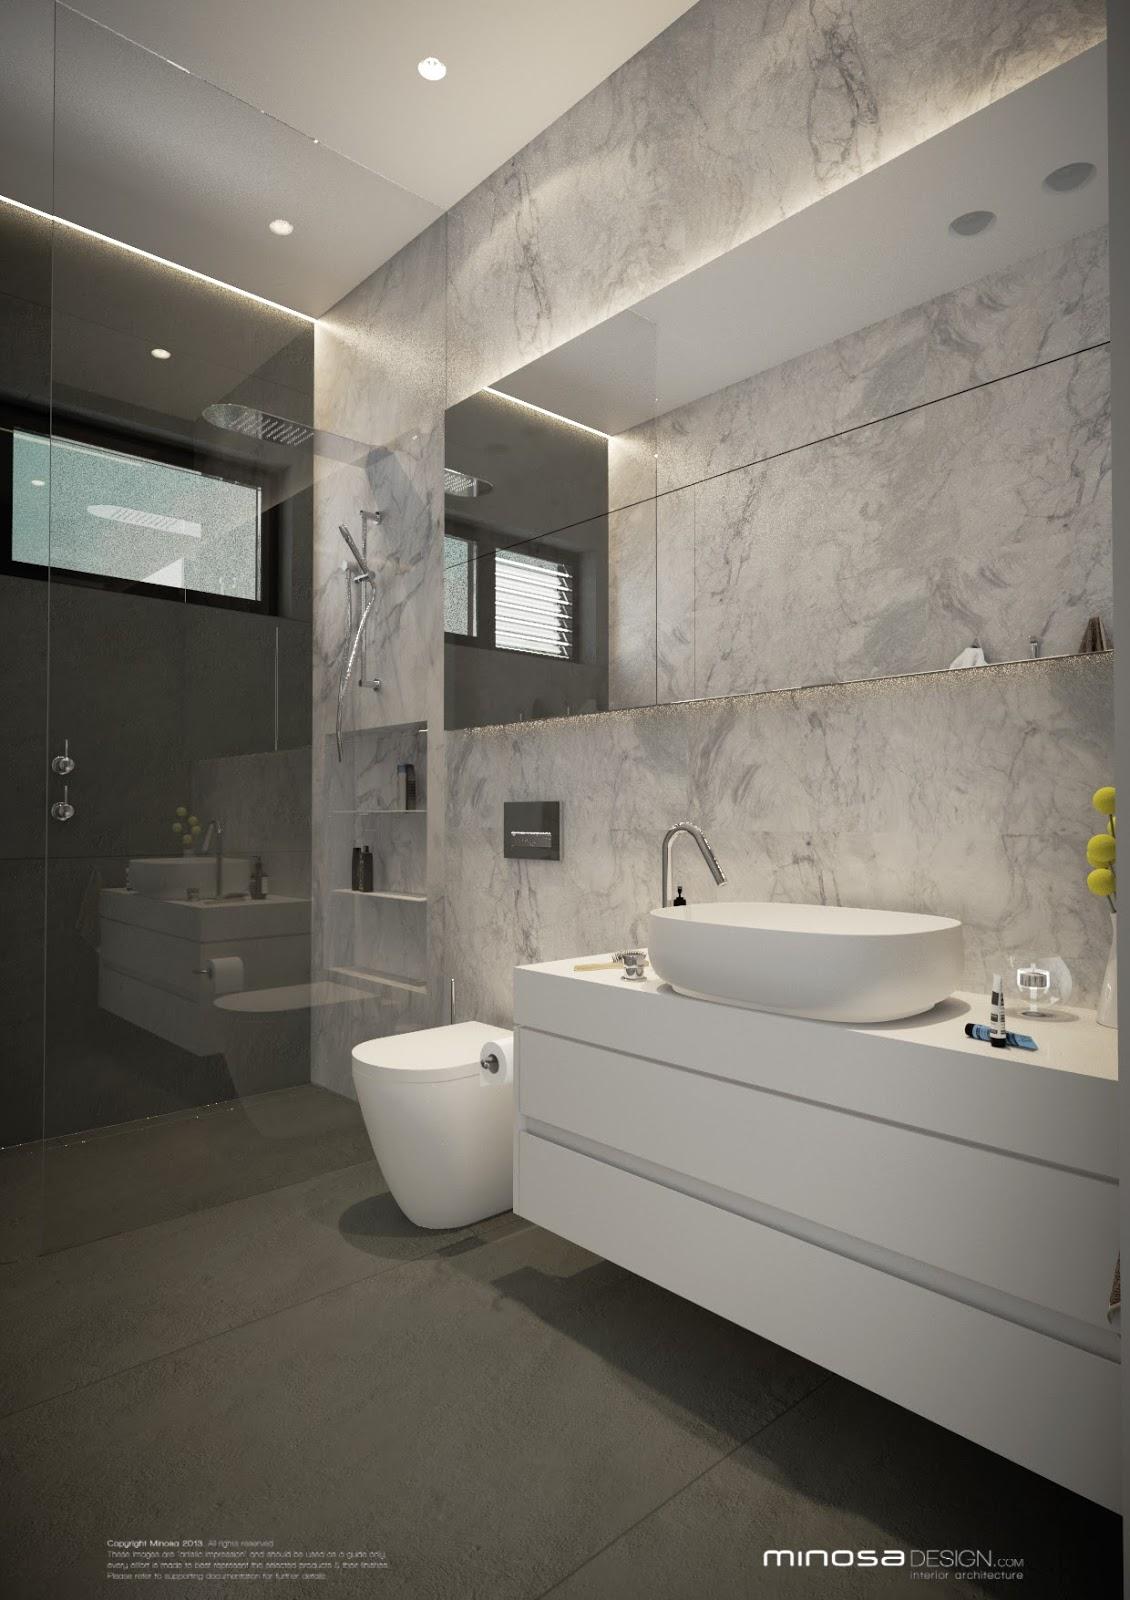 Minosa: Modern Monochrome Bathroom Design